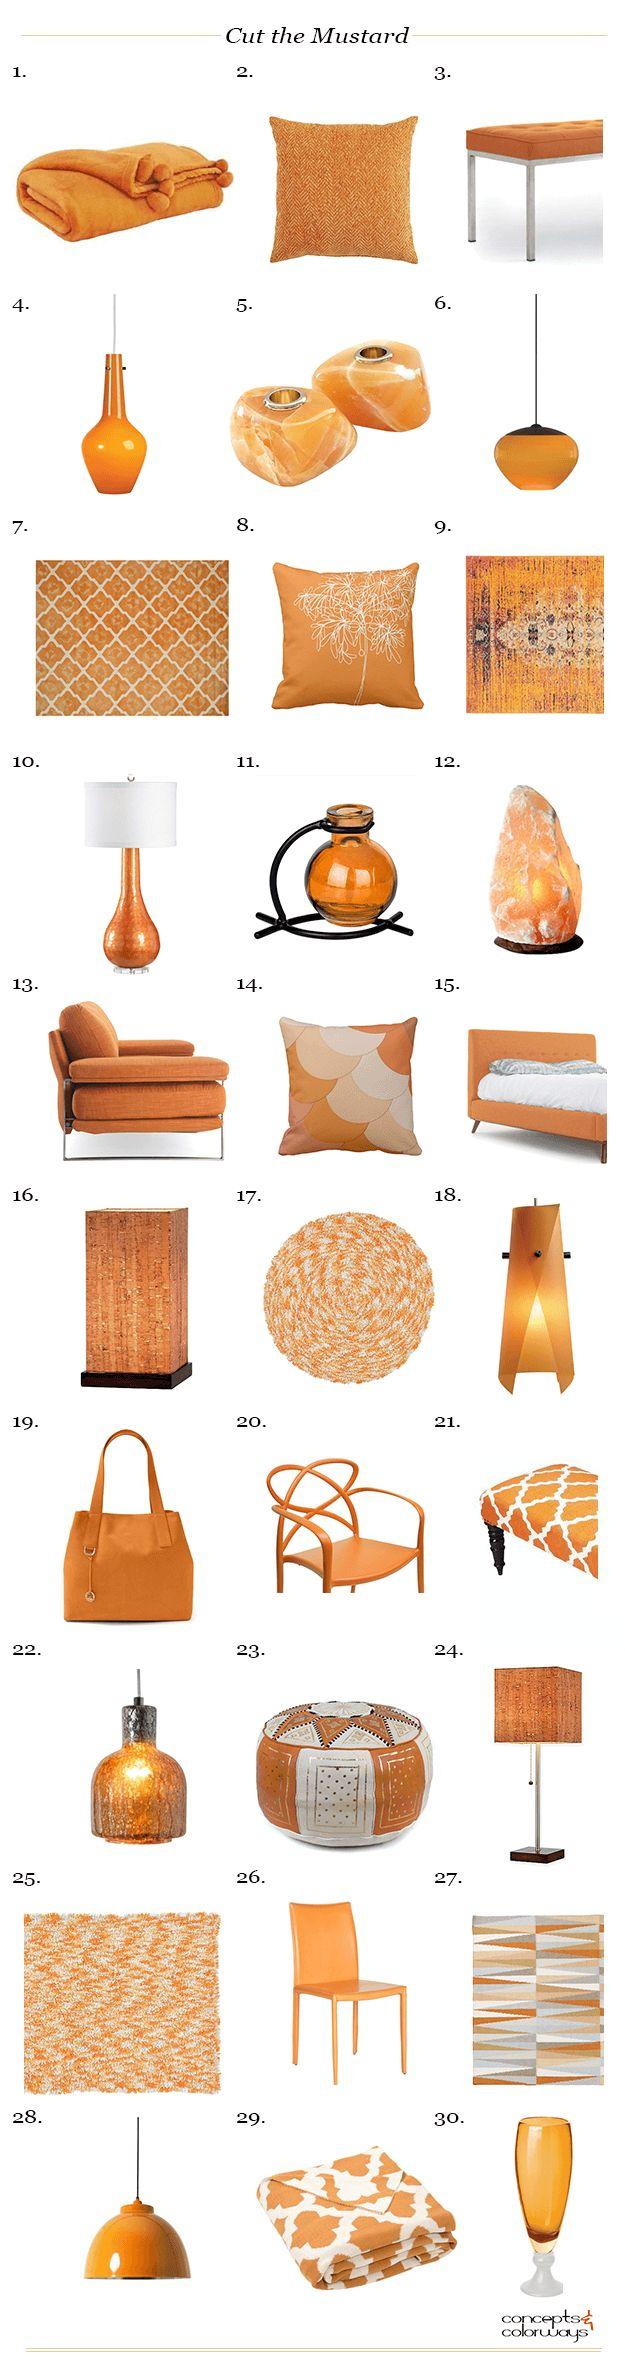 sherwin williams cut the mustard, interiors product roundup, get the look, burnt orange interiors, rust orange interiors, curry orange interiors